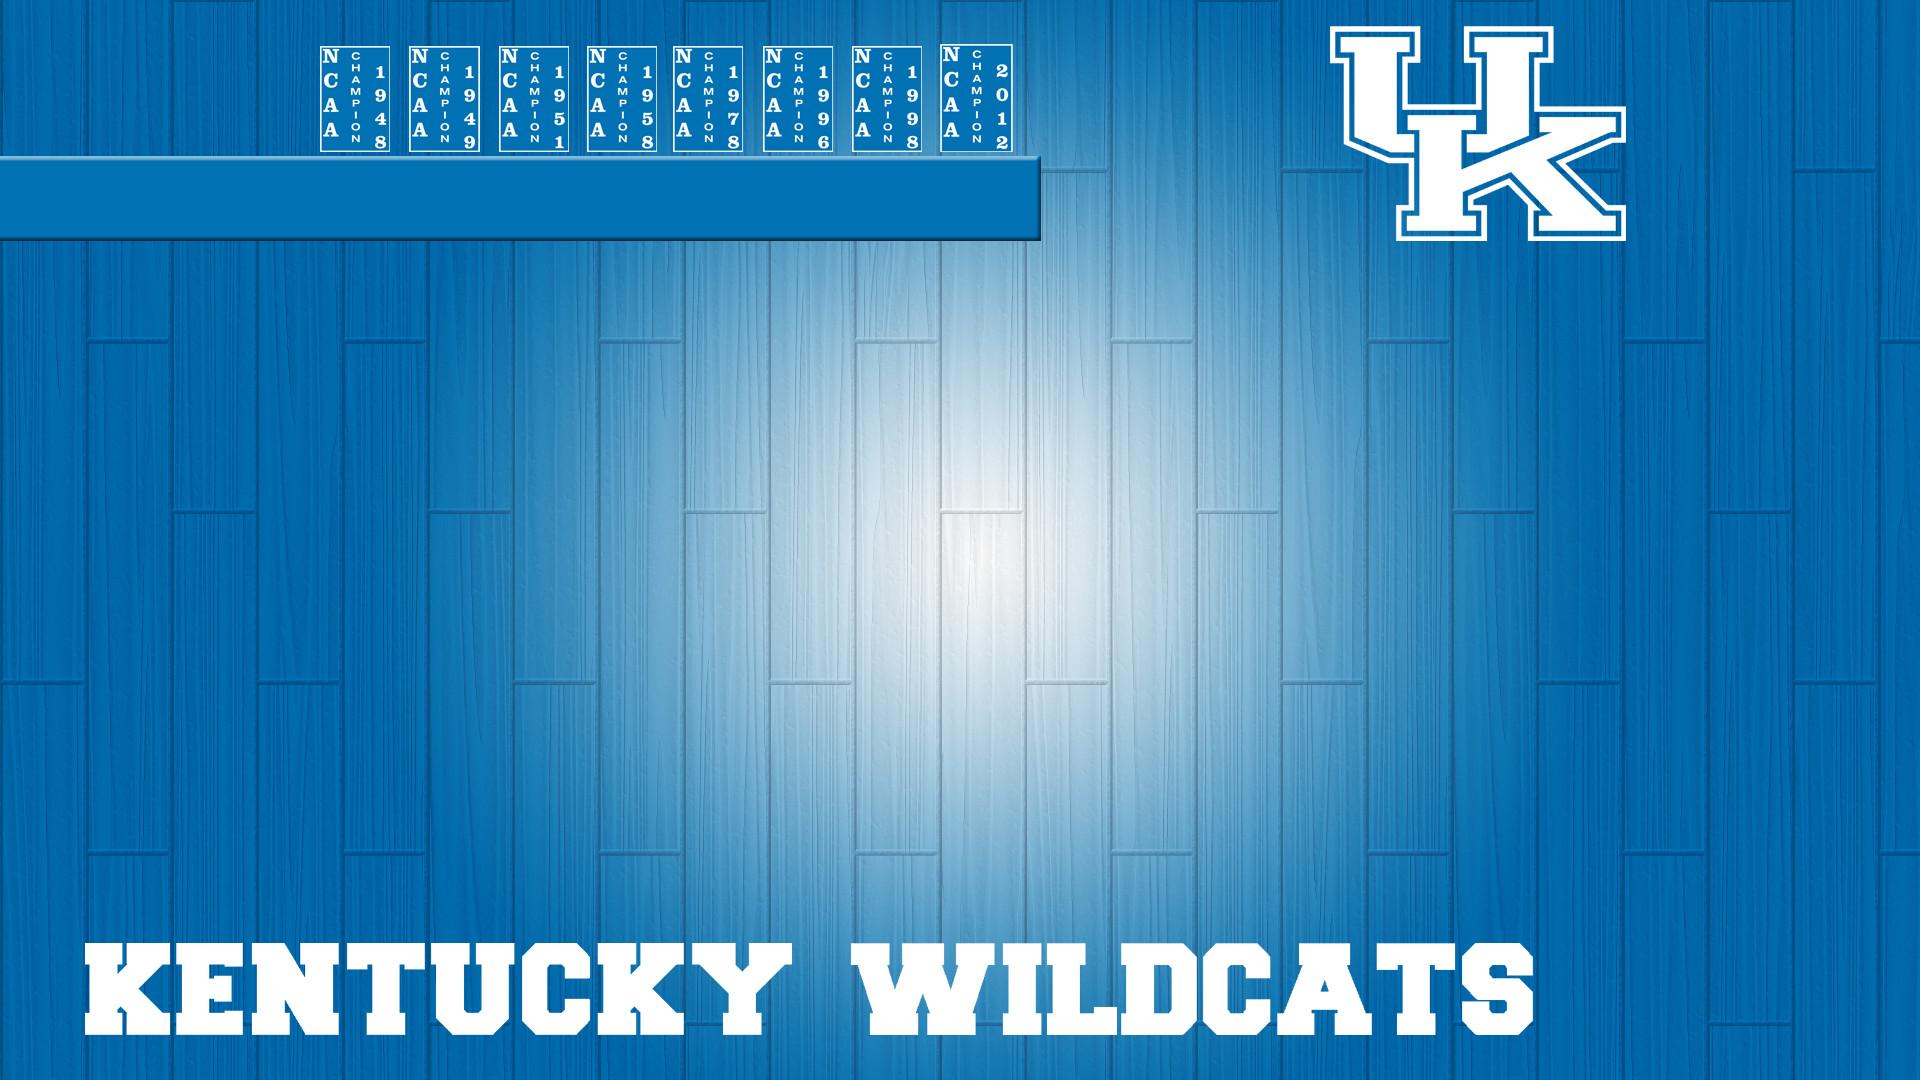 Kentucky Wildcats Xbox One theme – Xbox One Backgrounds Themer